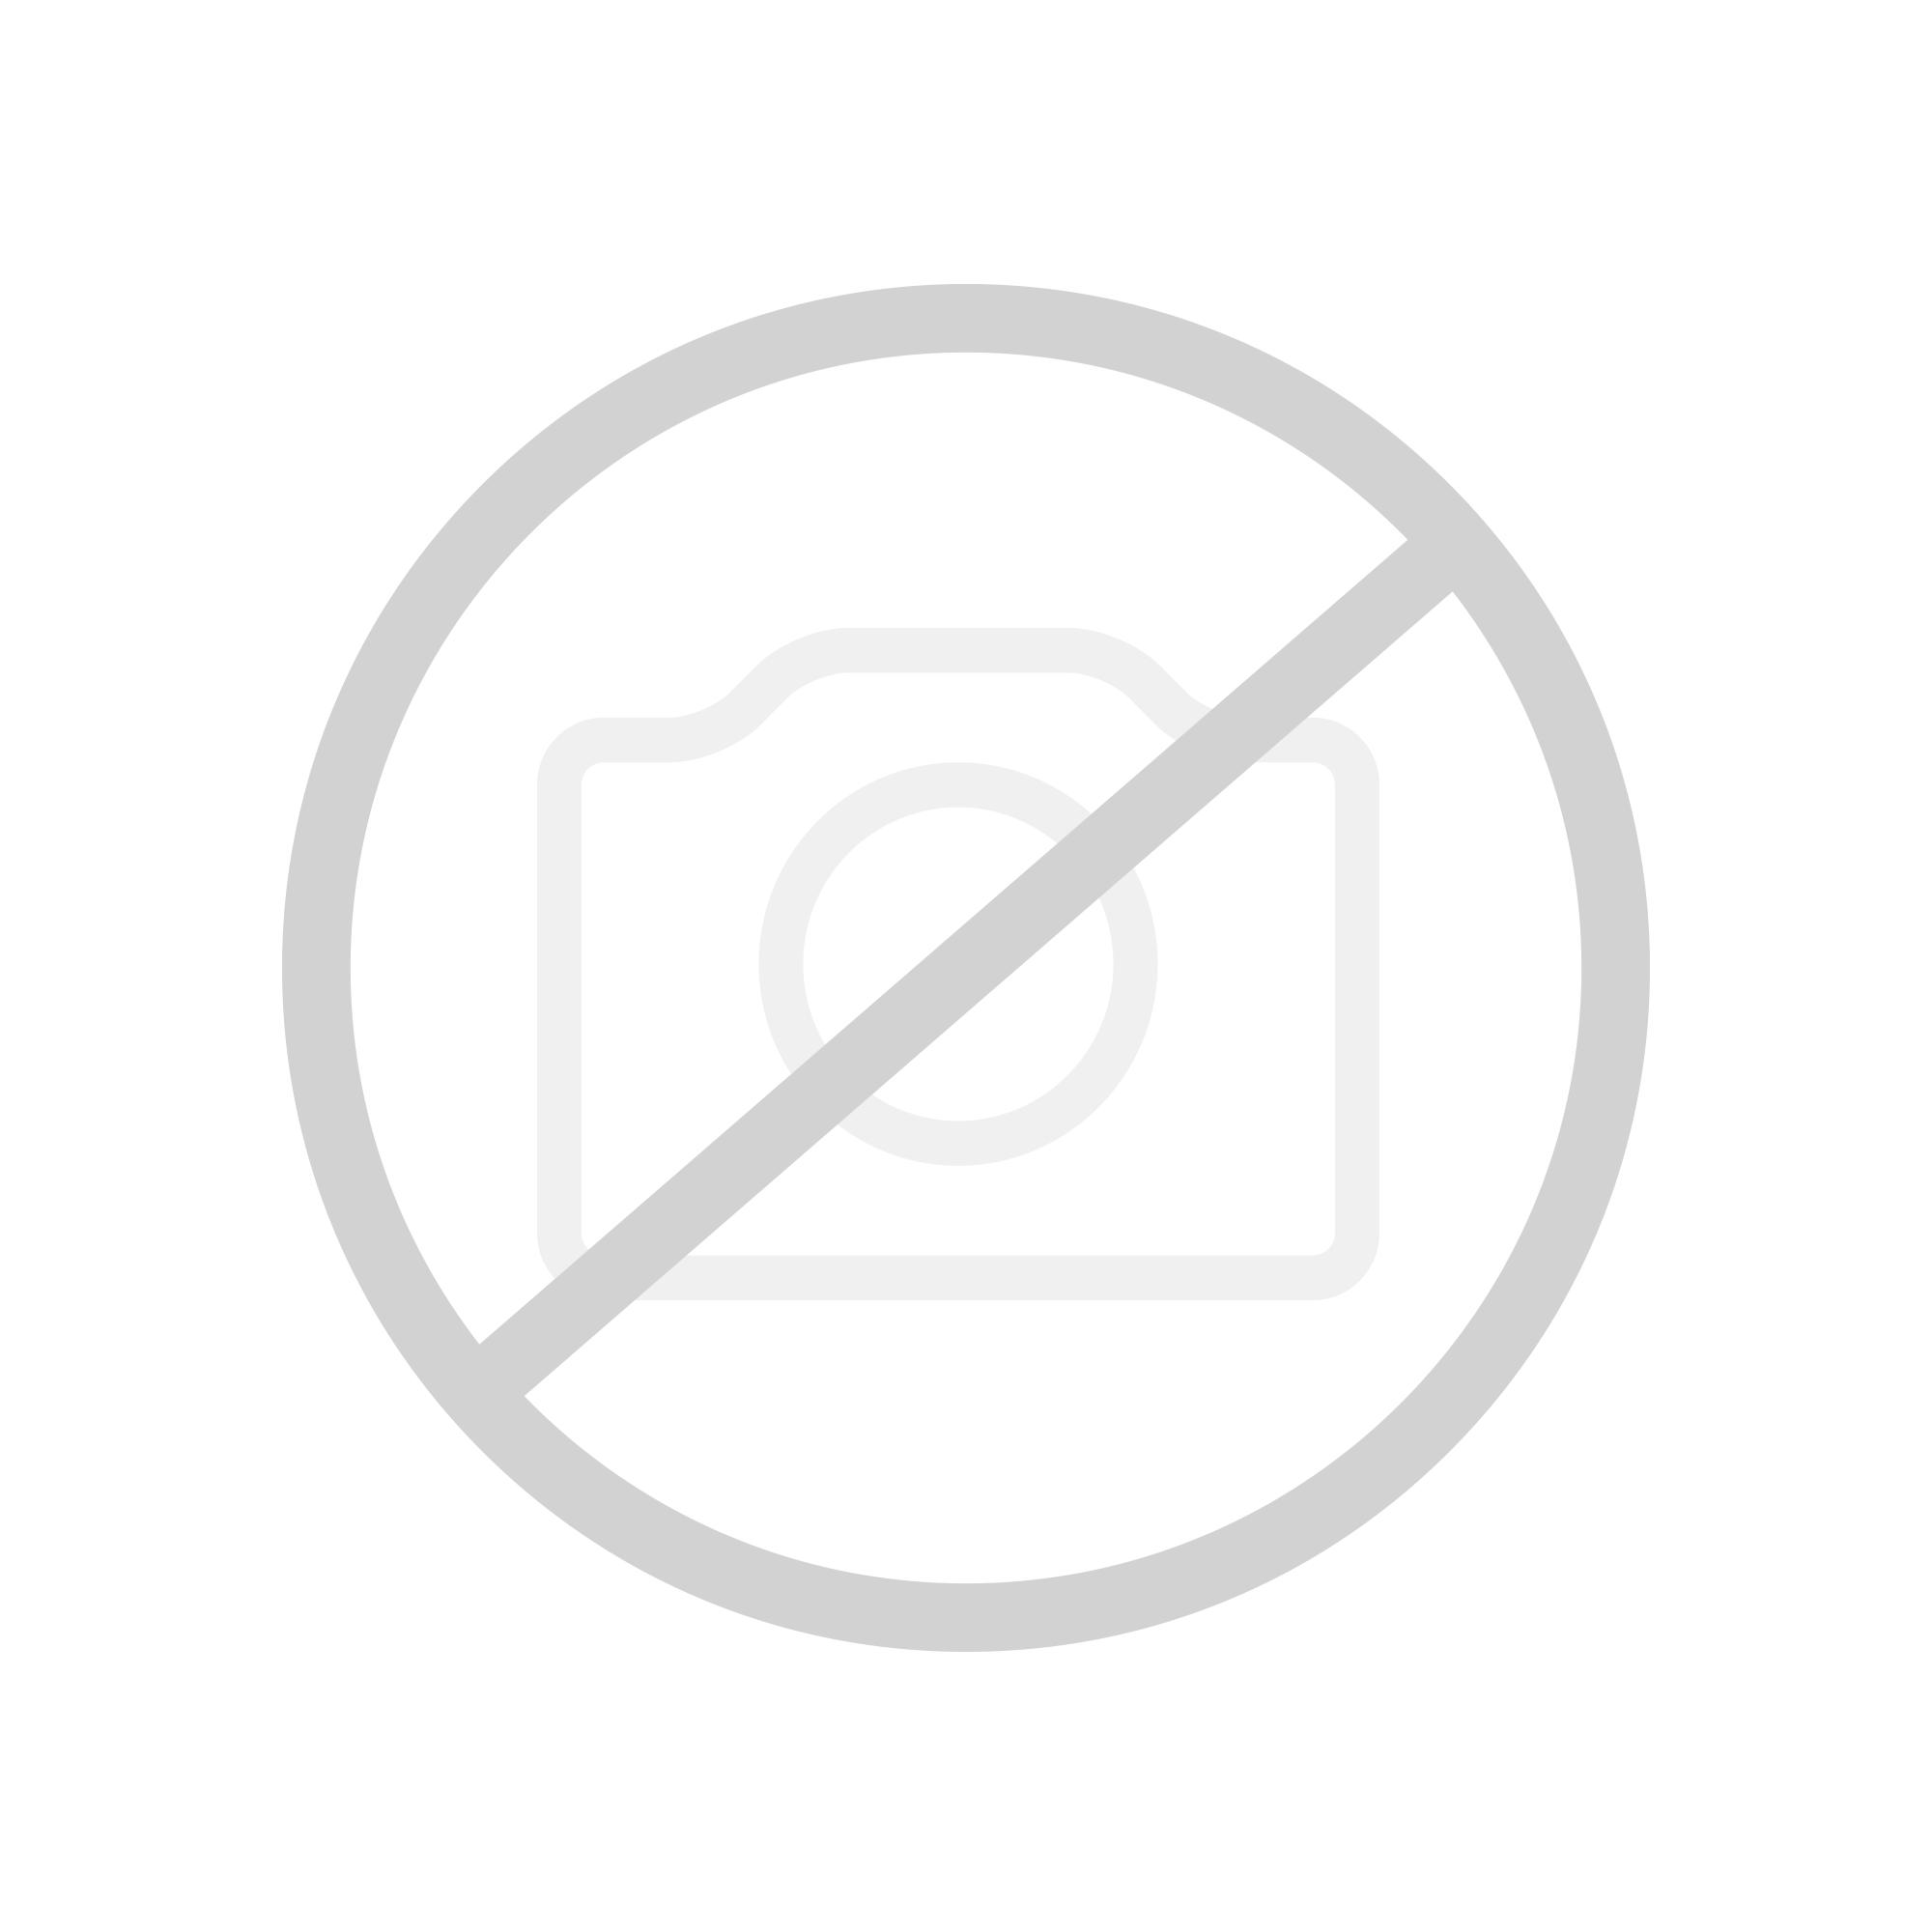 Hansa Living Fertigmontage-Installationspaket 08 Thermostat-Batterie